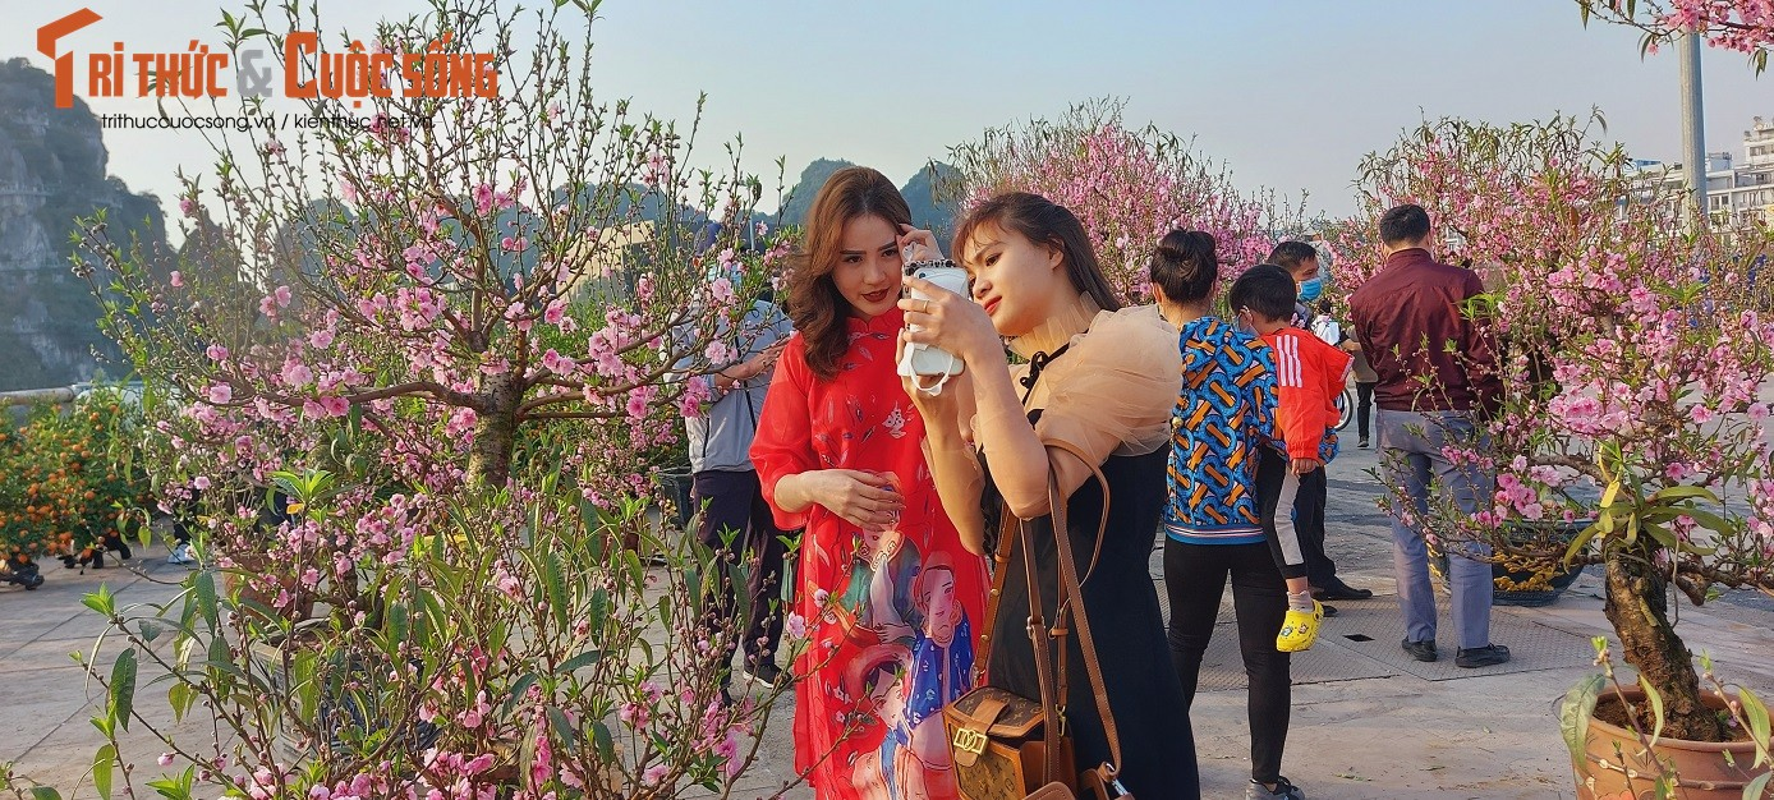 Nguoi dan Quang Ninh ngam hoa Xuan, tam quen met moi vi COVID-19-Hinh-7